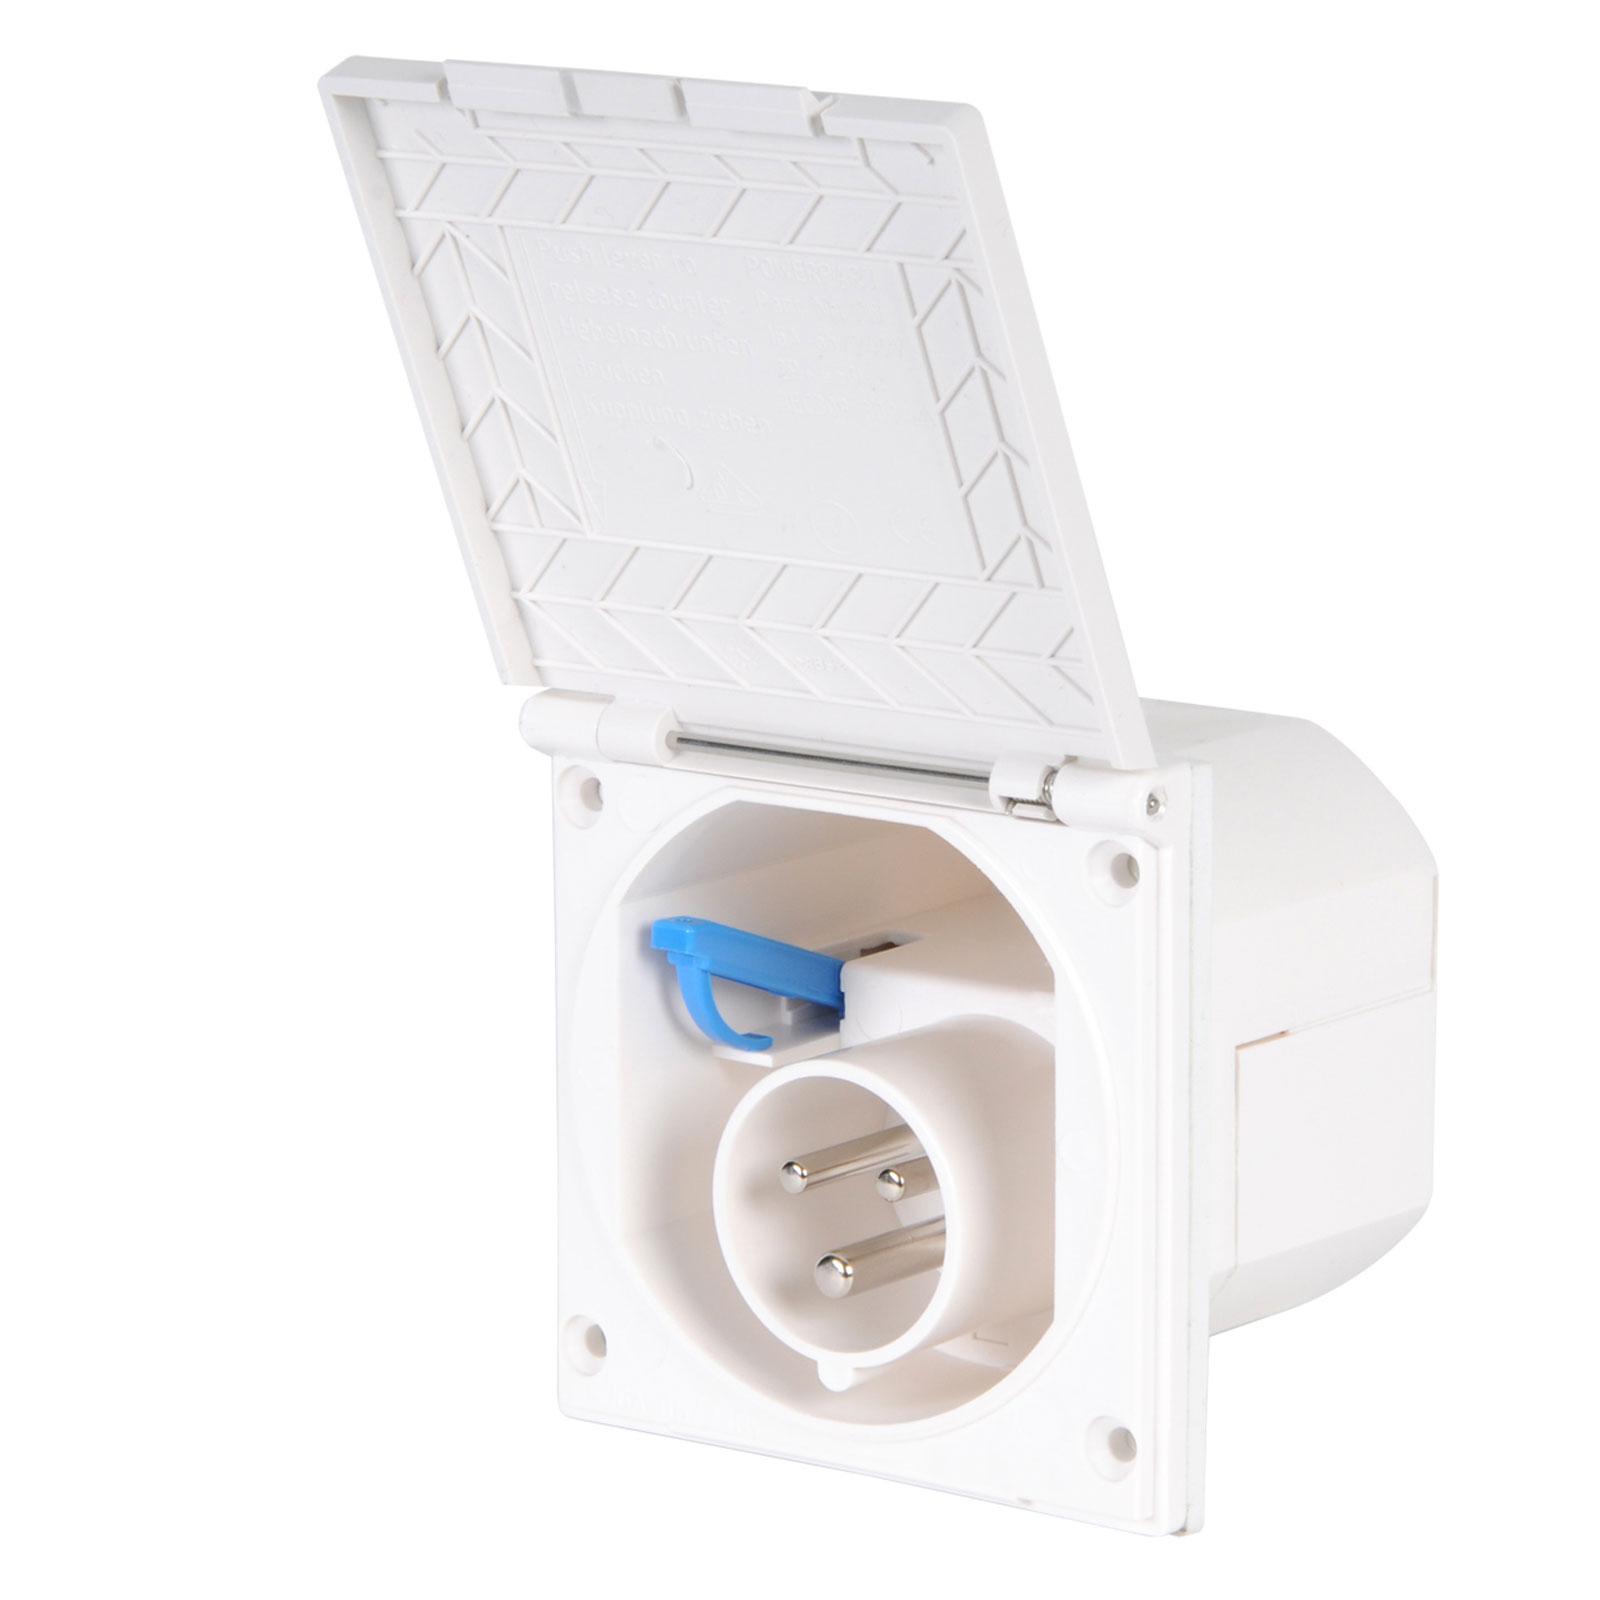 CEE Aussensteckdose Spritzwasser geschützt 200-240V, 16A, IP44, weiß